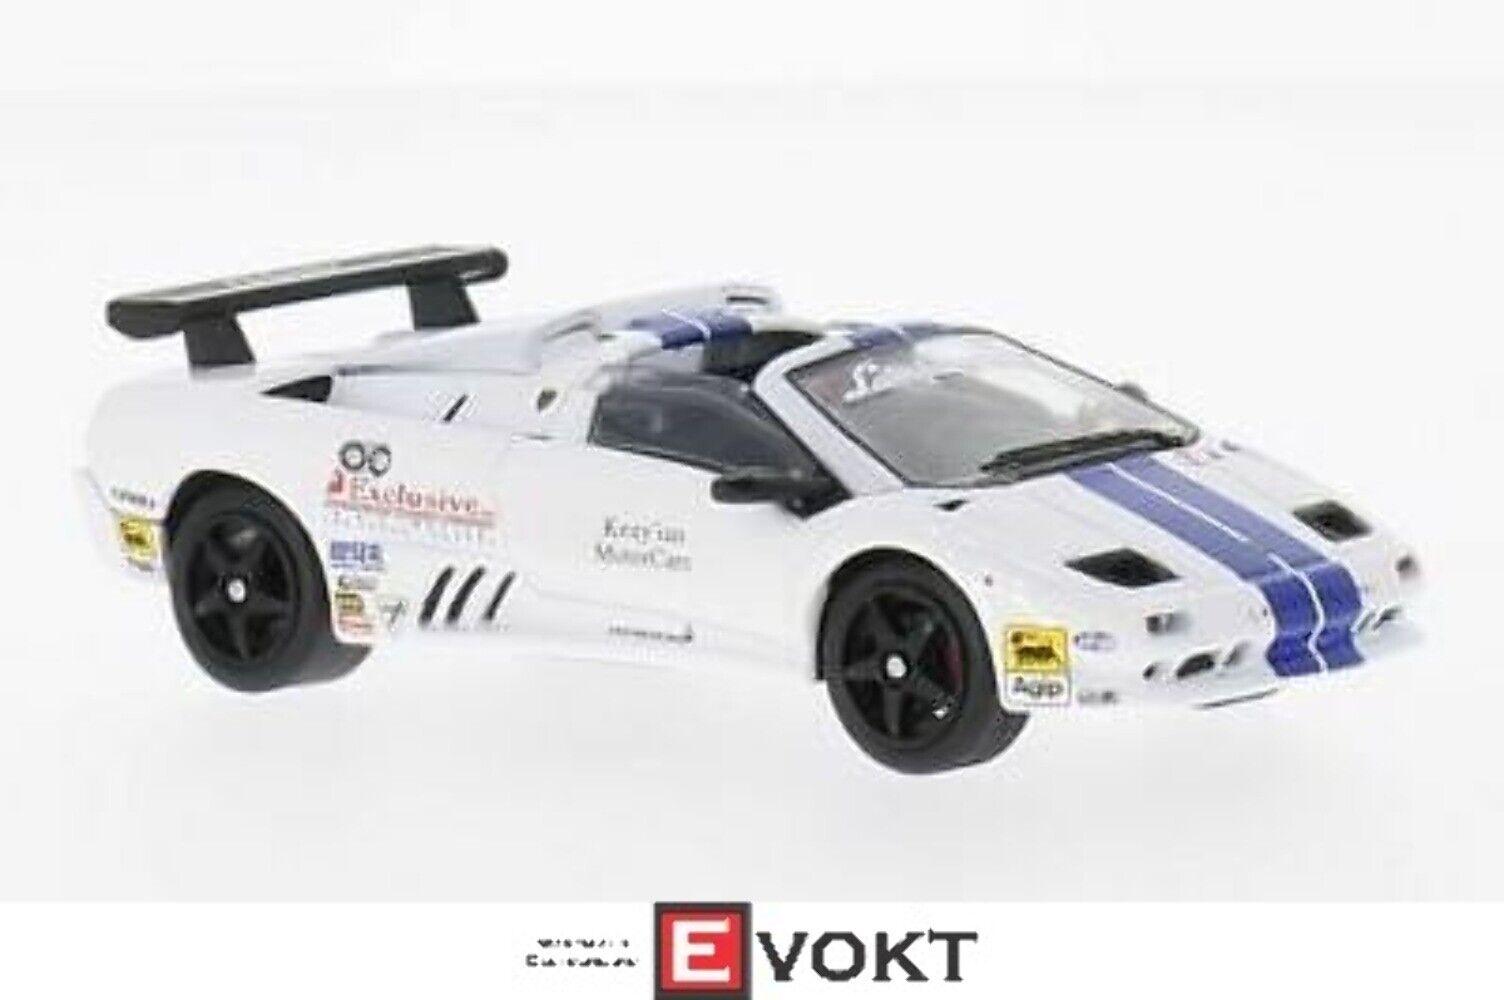 Lamborghini Diablo VT-R Roadster Trofeo,bianca blu,1 43,biancaBox